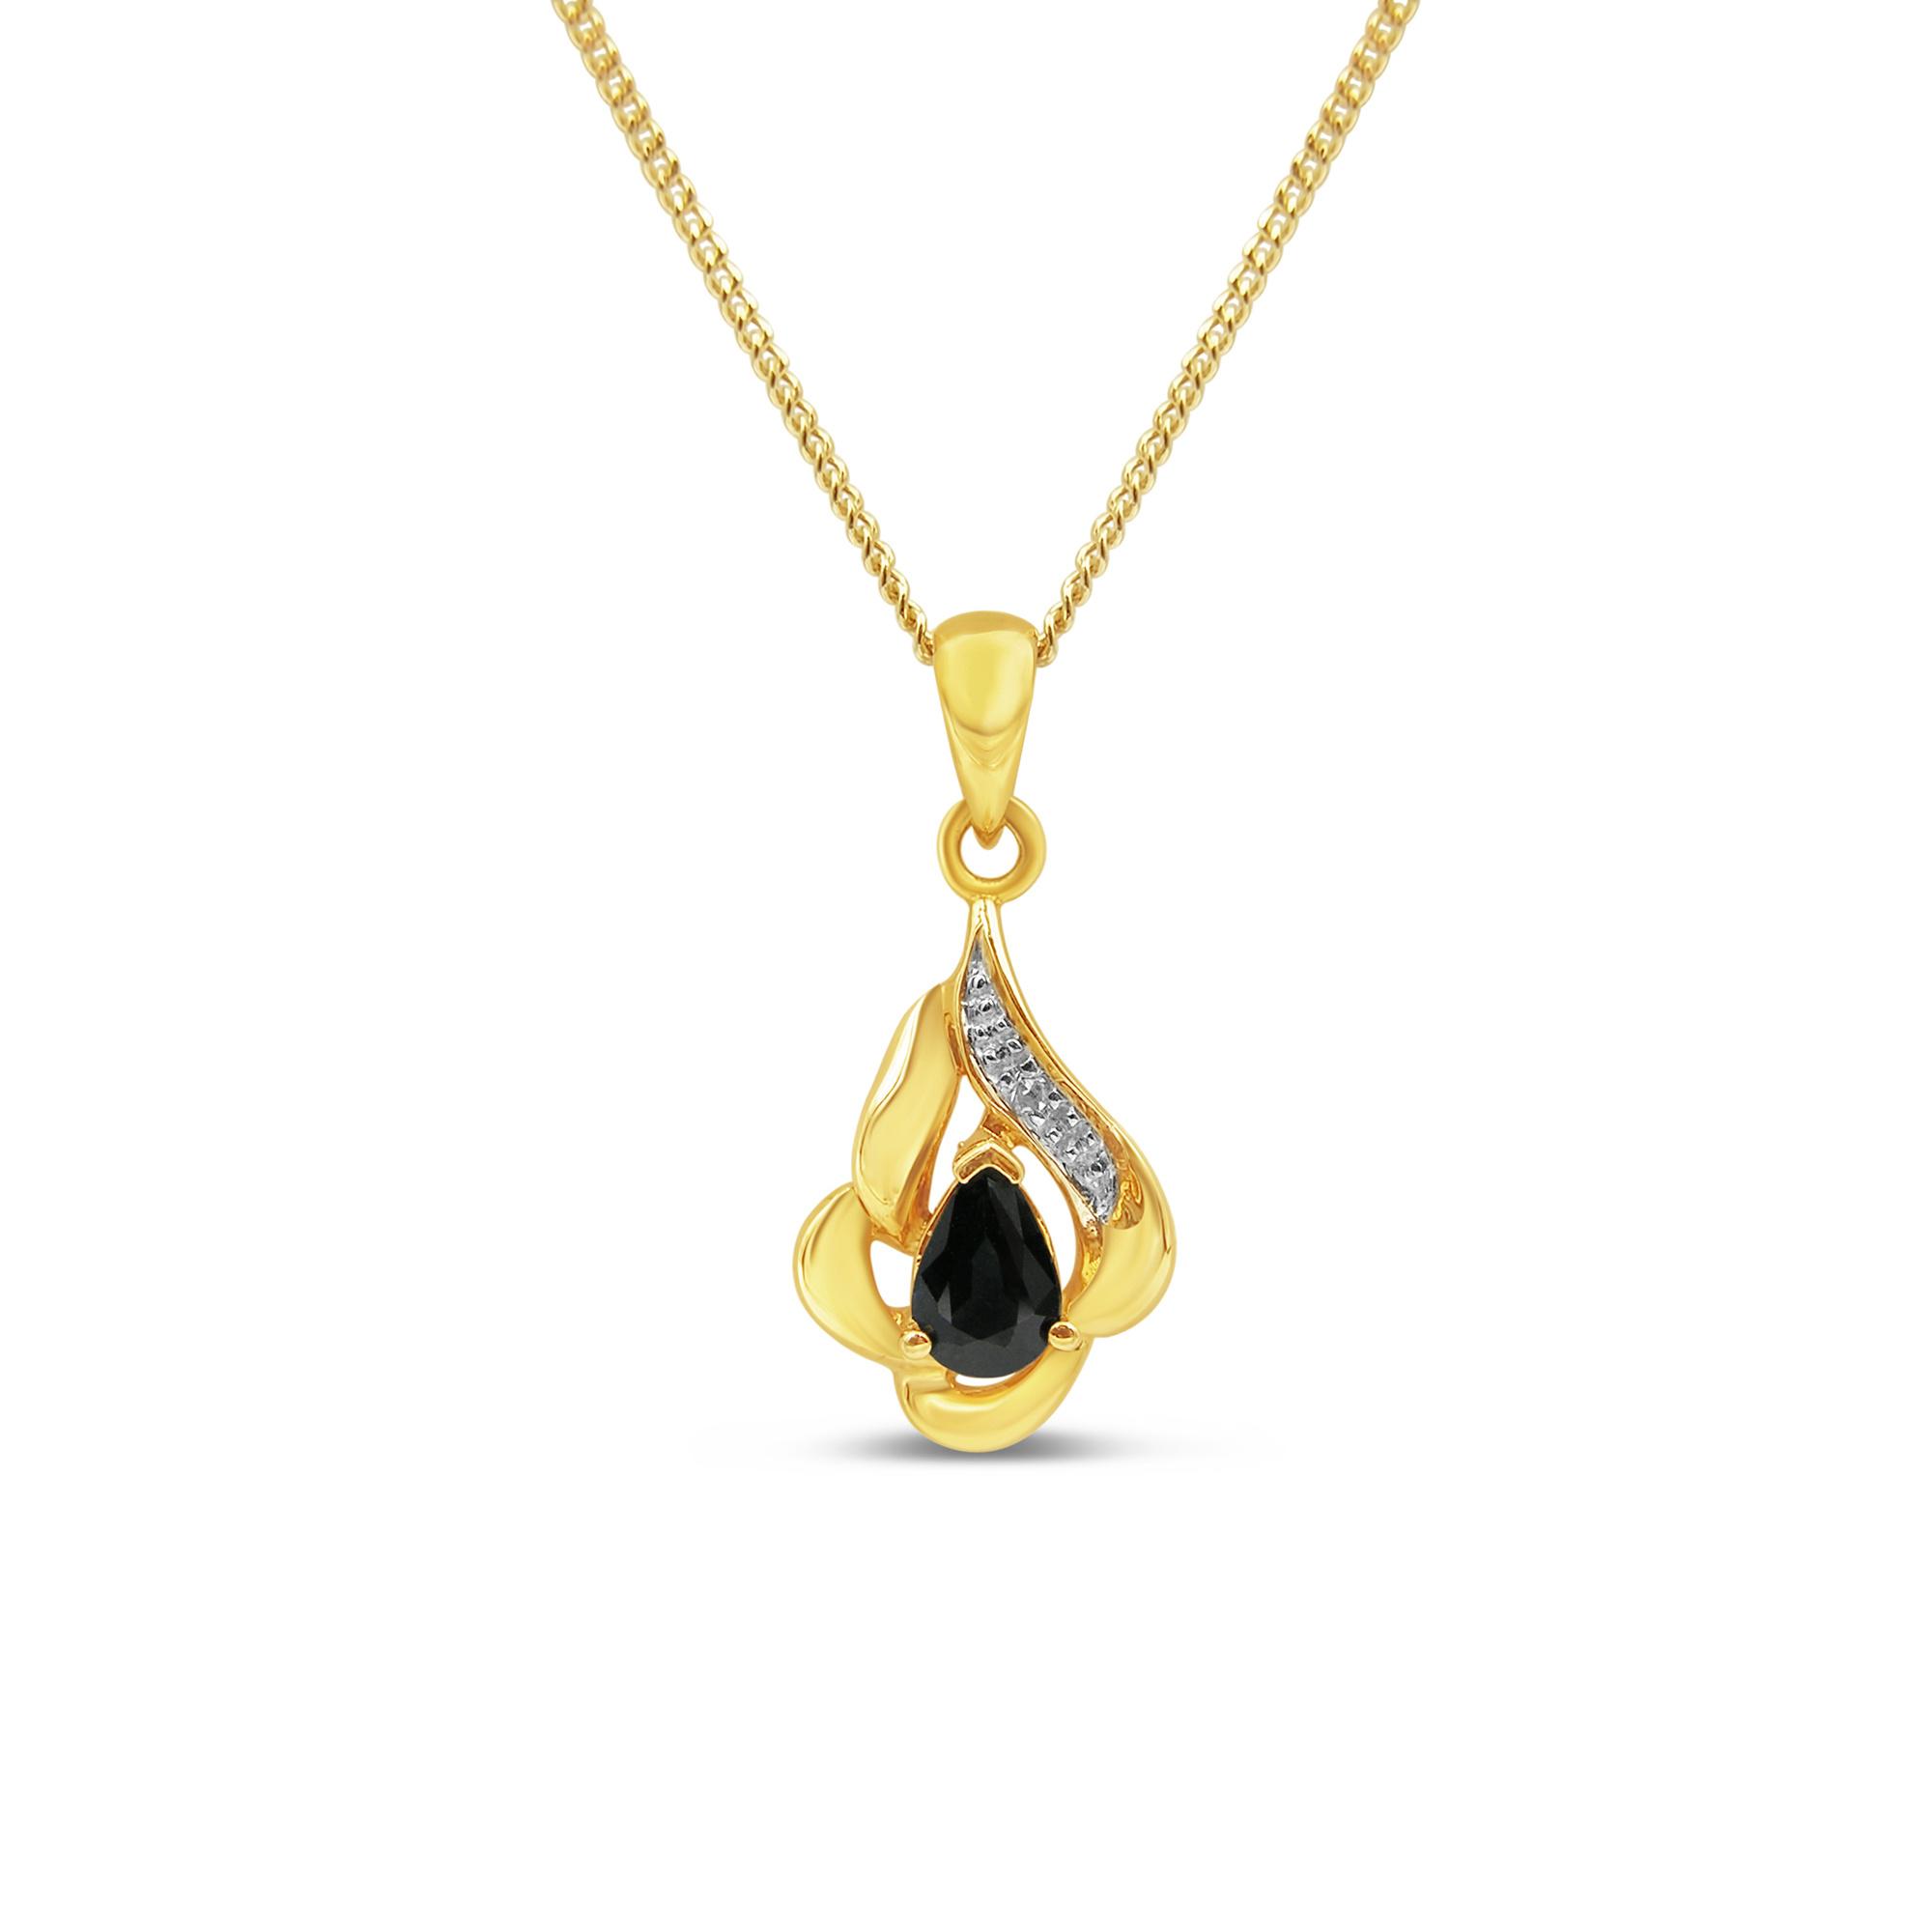 18kt yellow gold pendant with 0.25 ct sapphire & 0.01 ct diamond